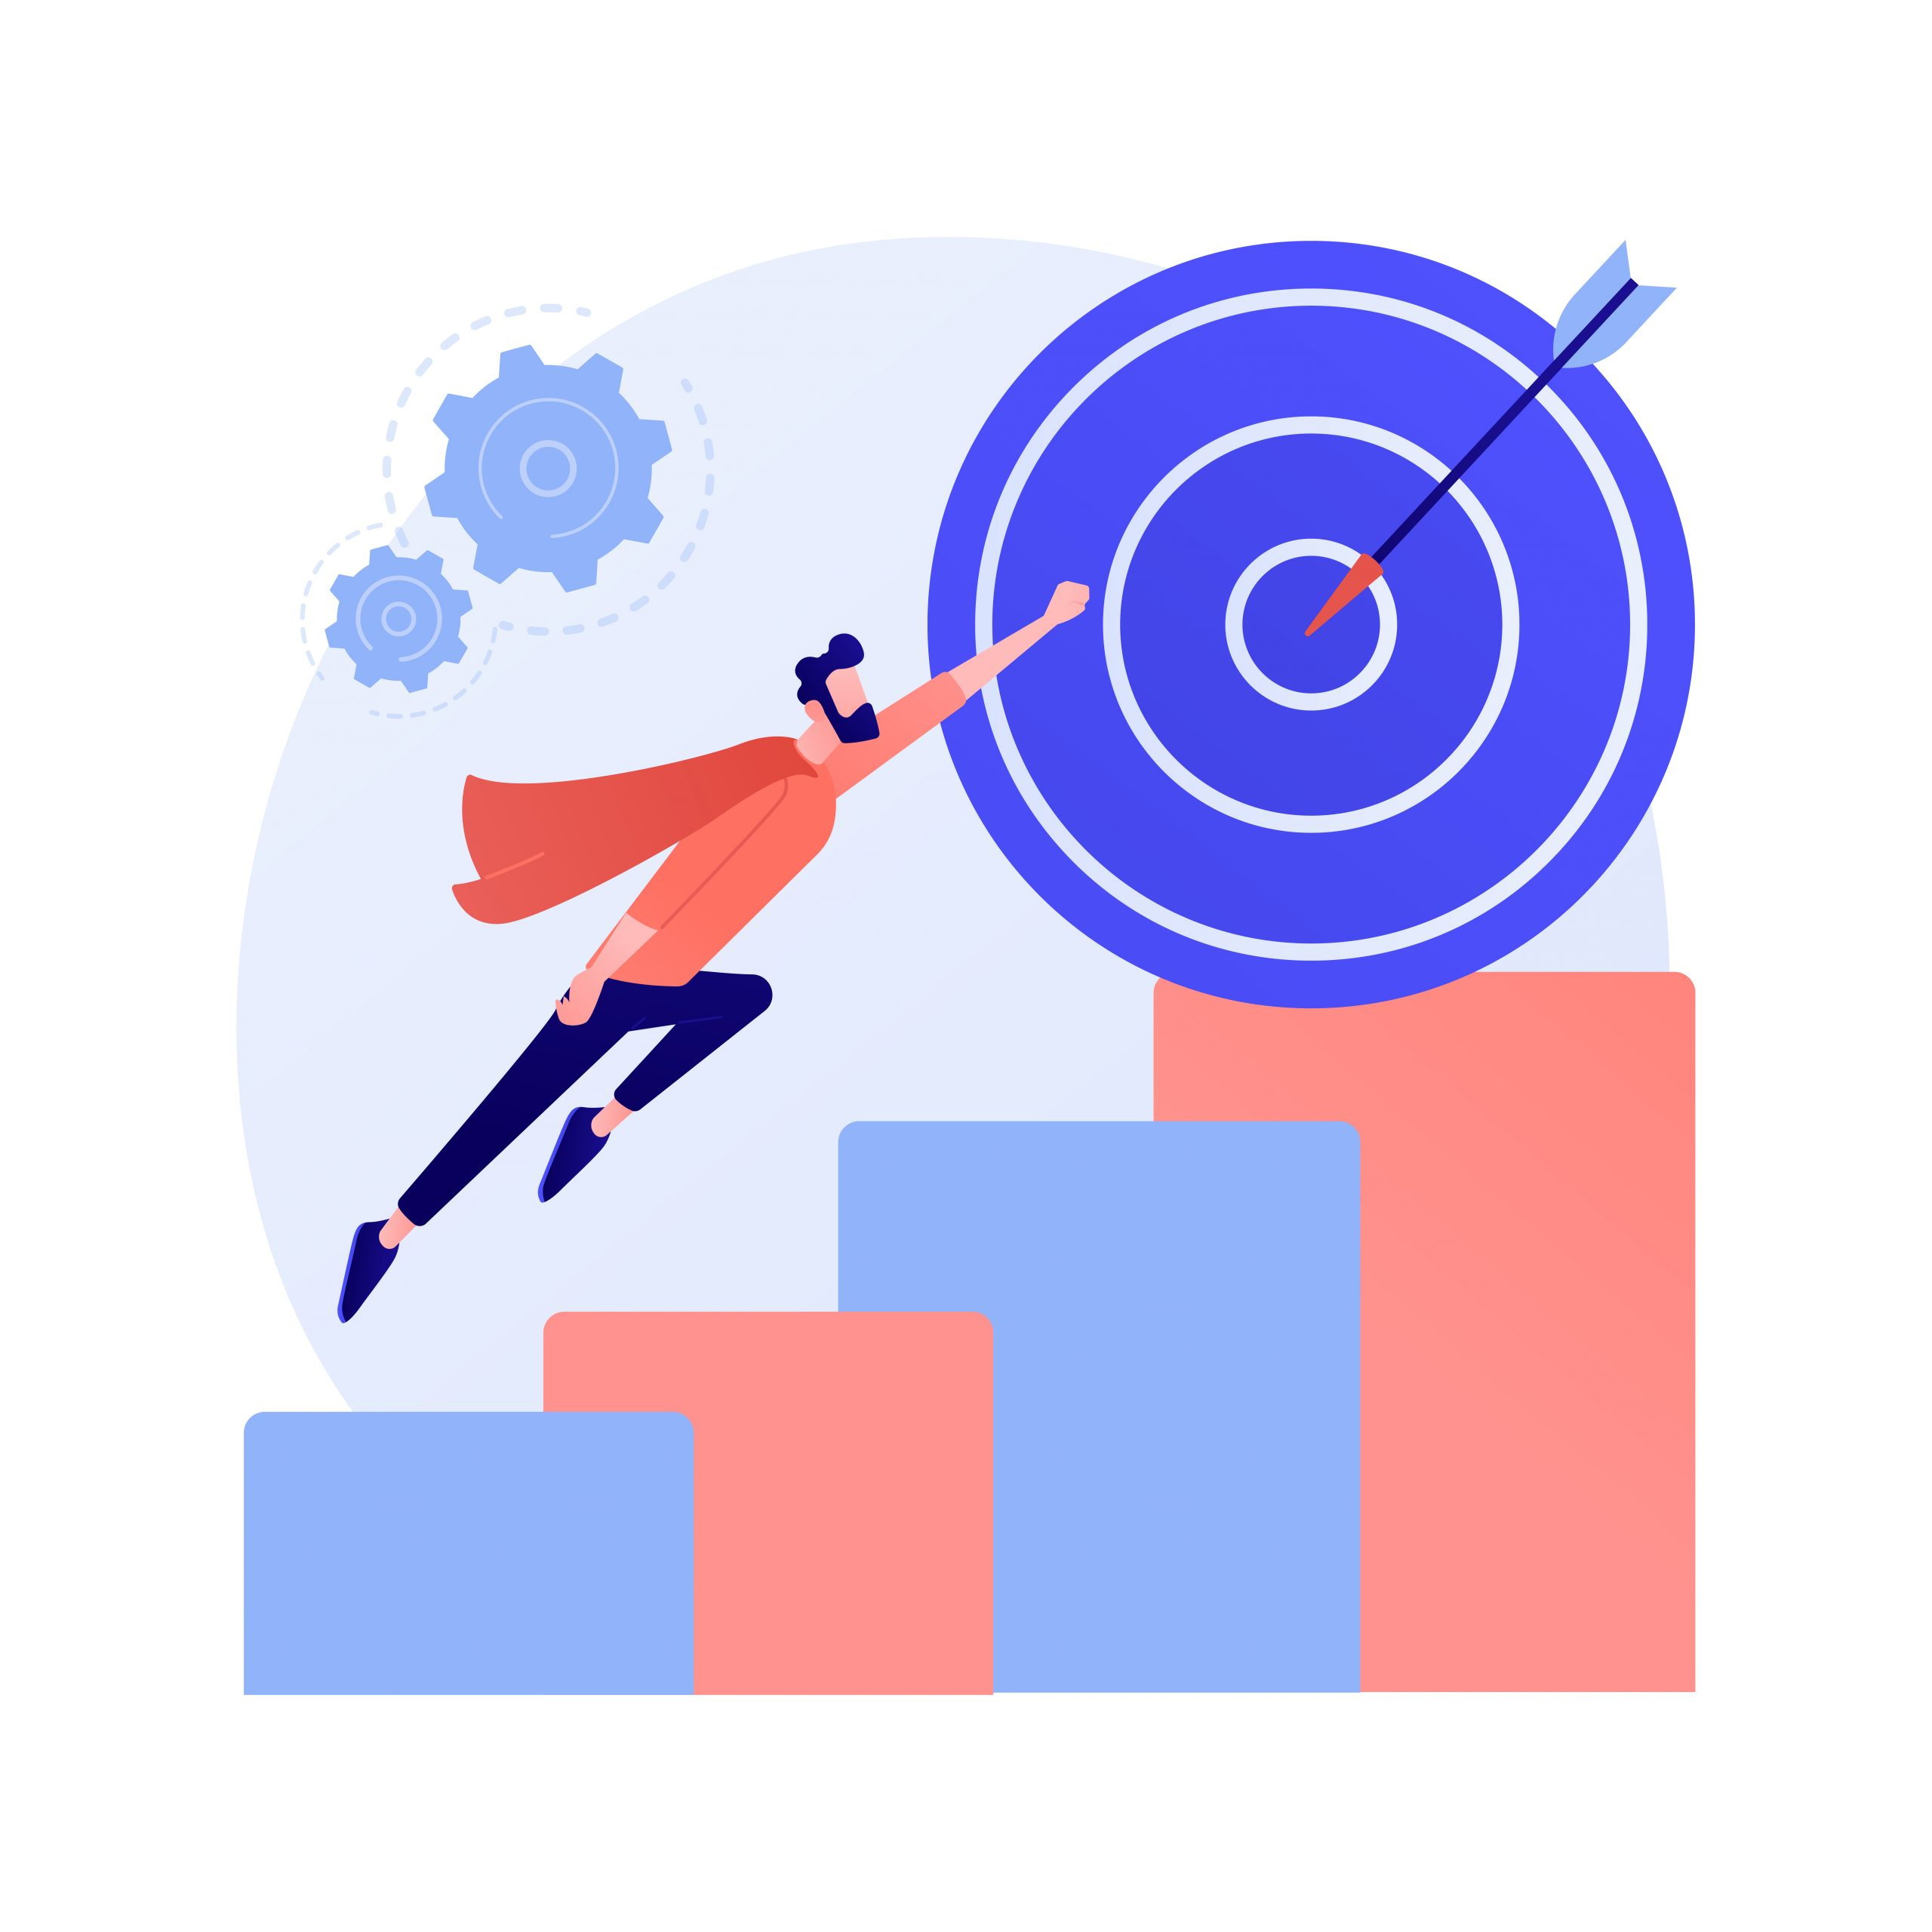 Reaching goal vector concept metaphor